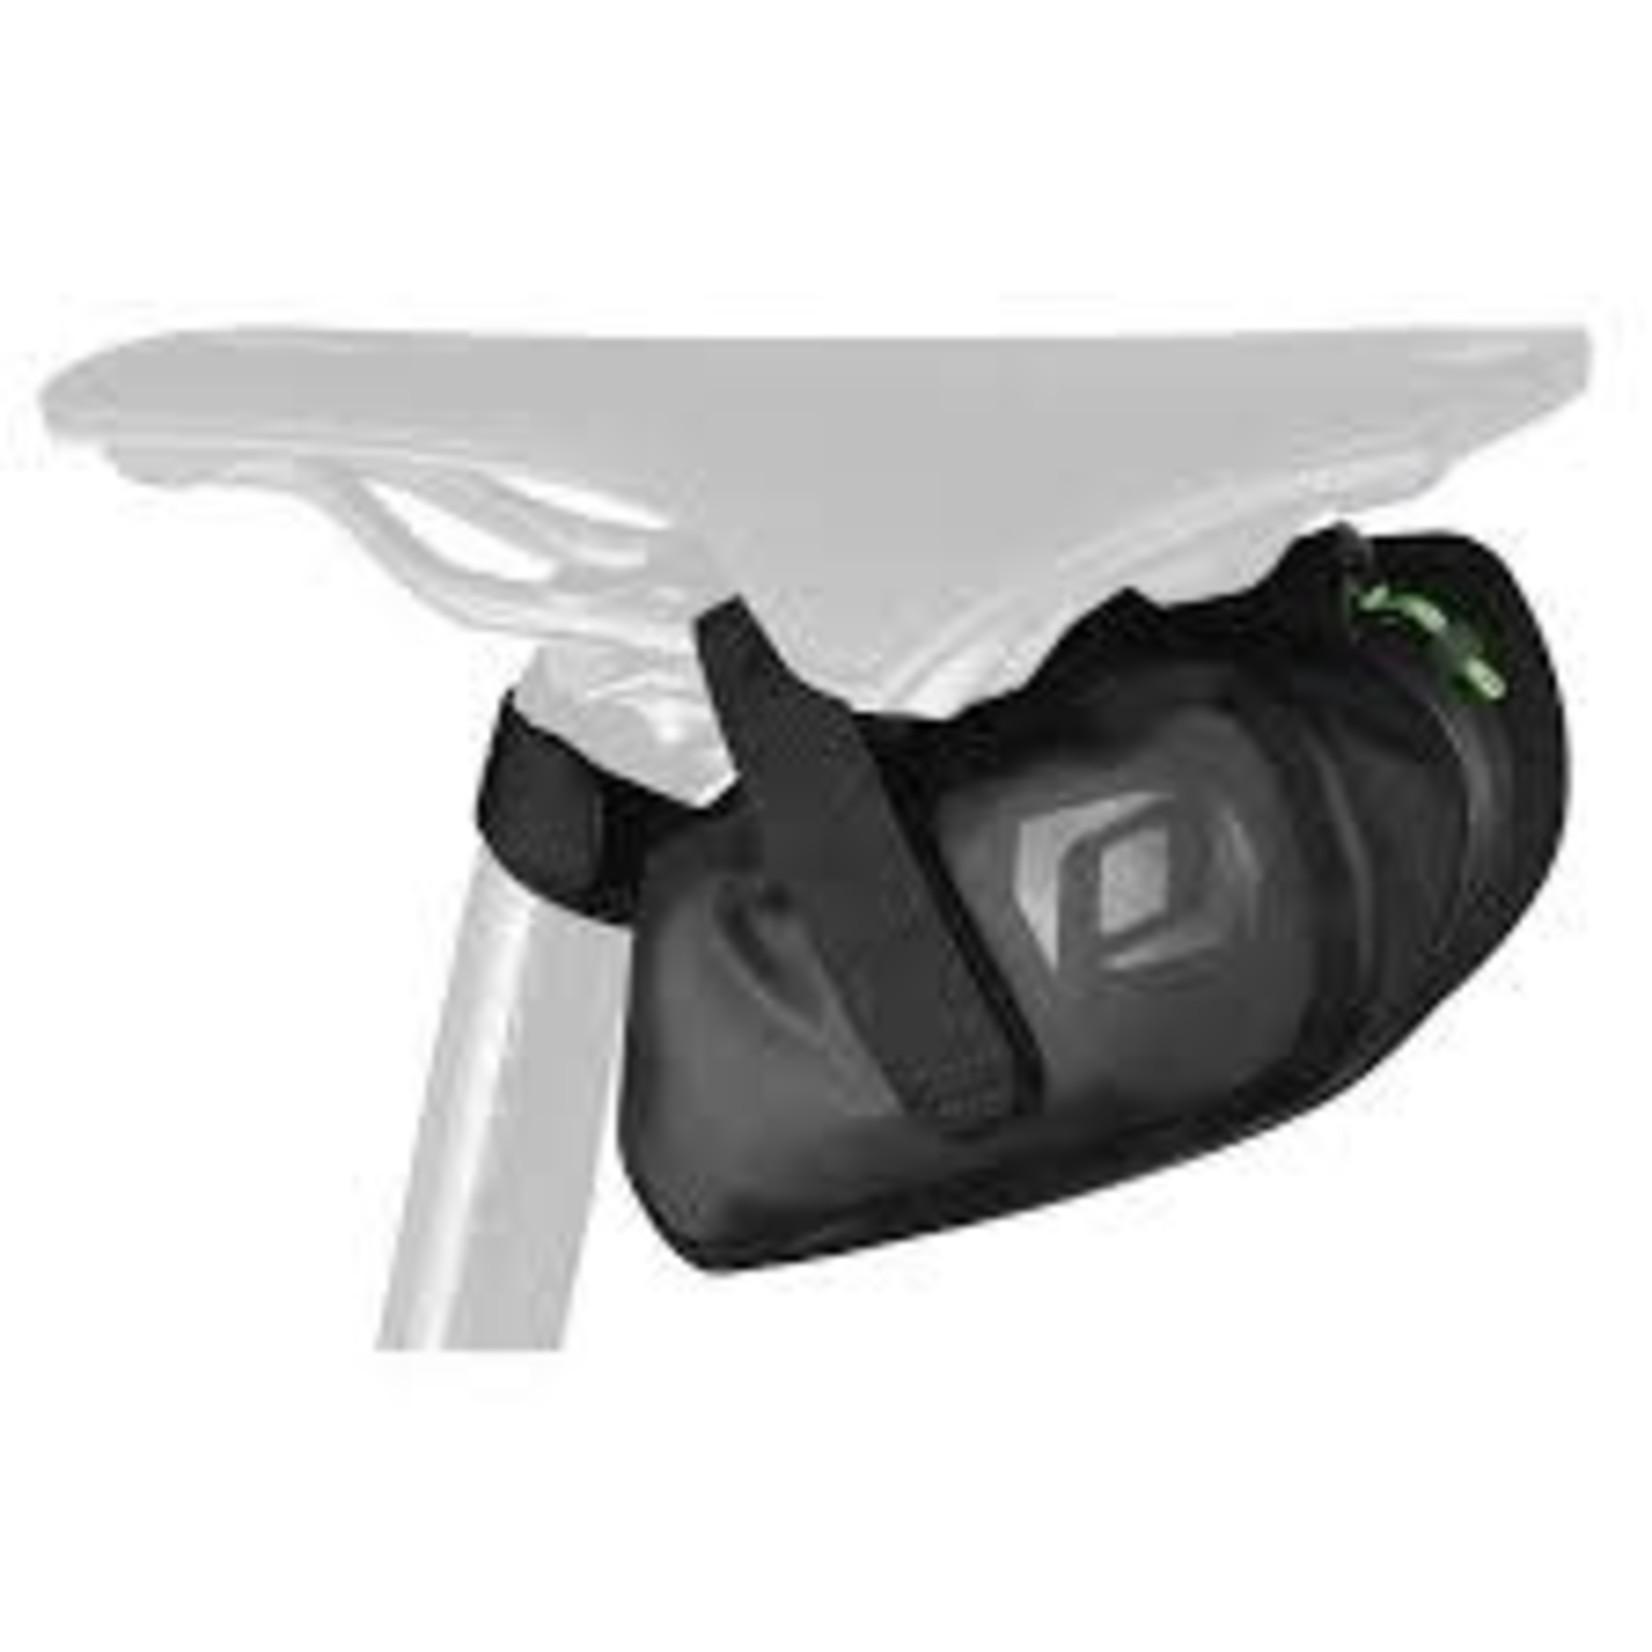 Scott SYN Saddle Bag WP 550 (Strap) black 1size